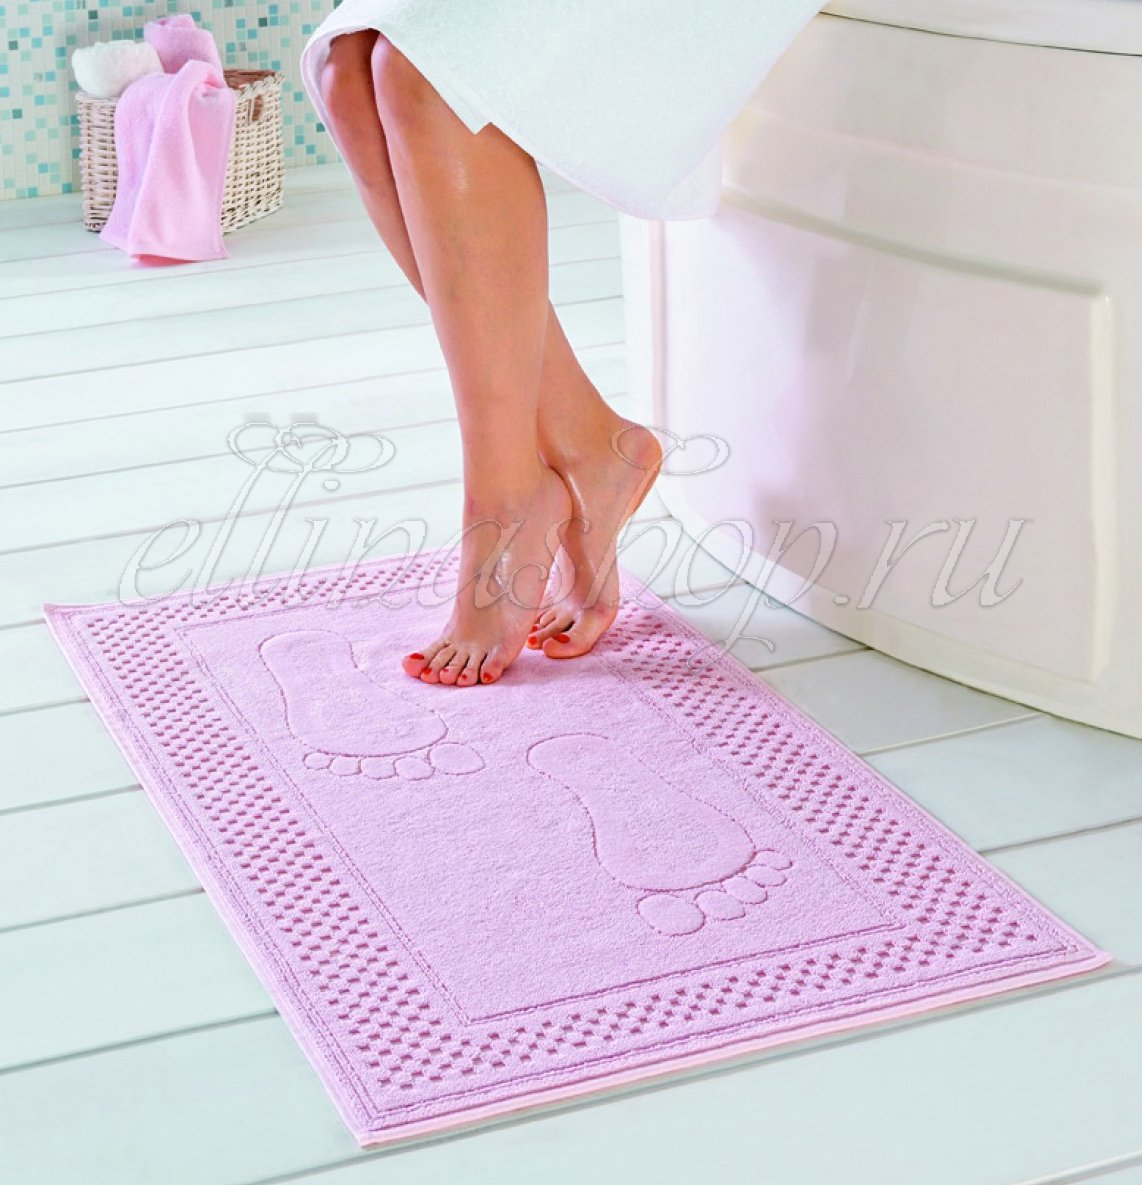 Step махровое полотенце для ног Soft Cotton